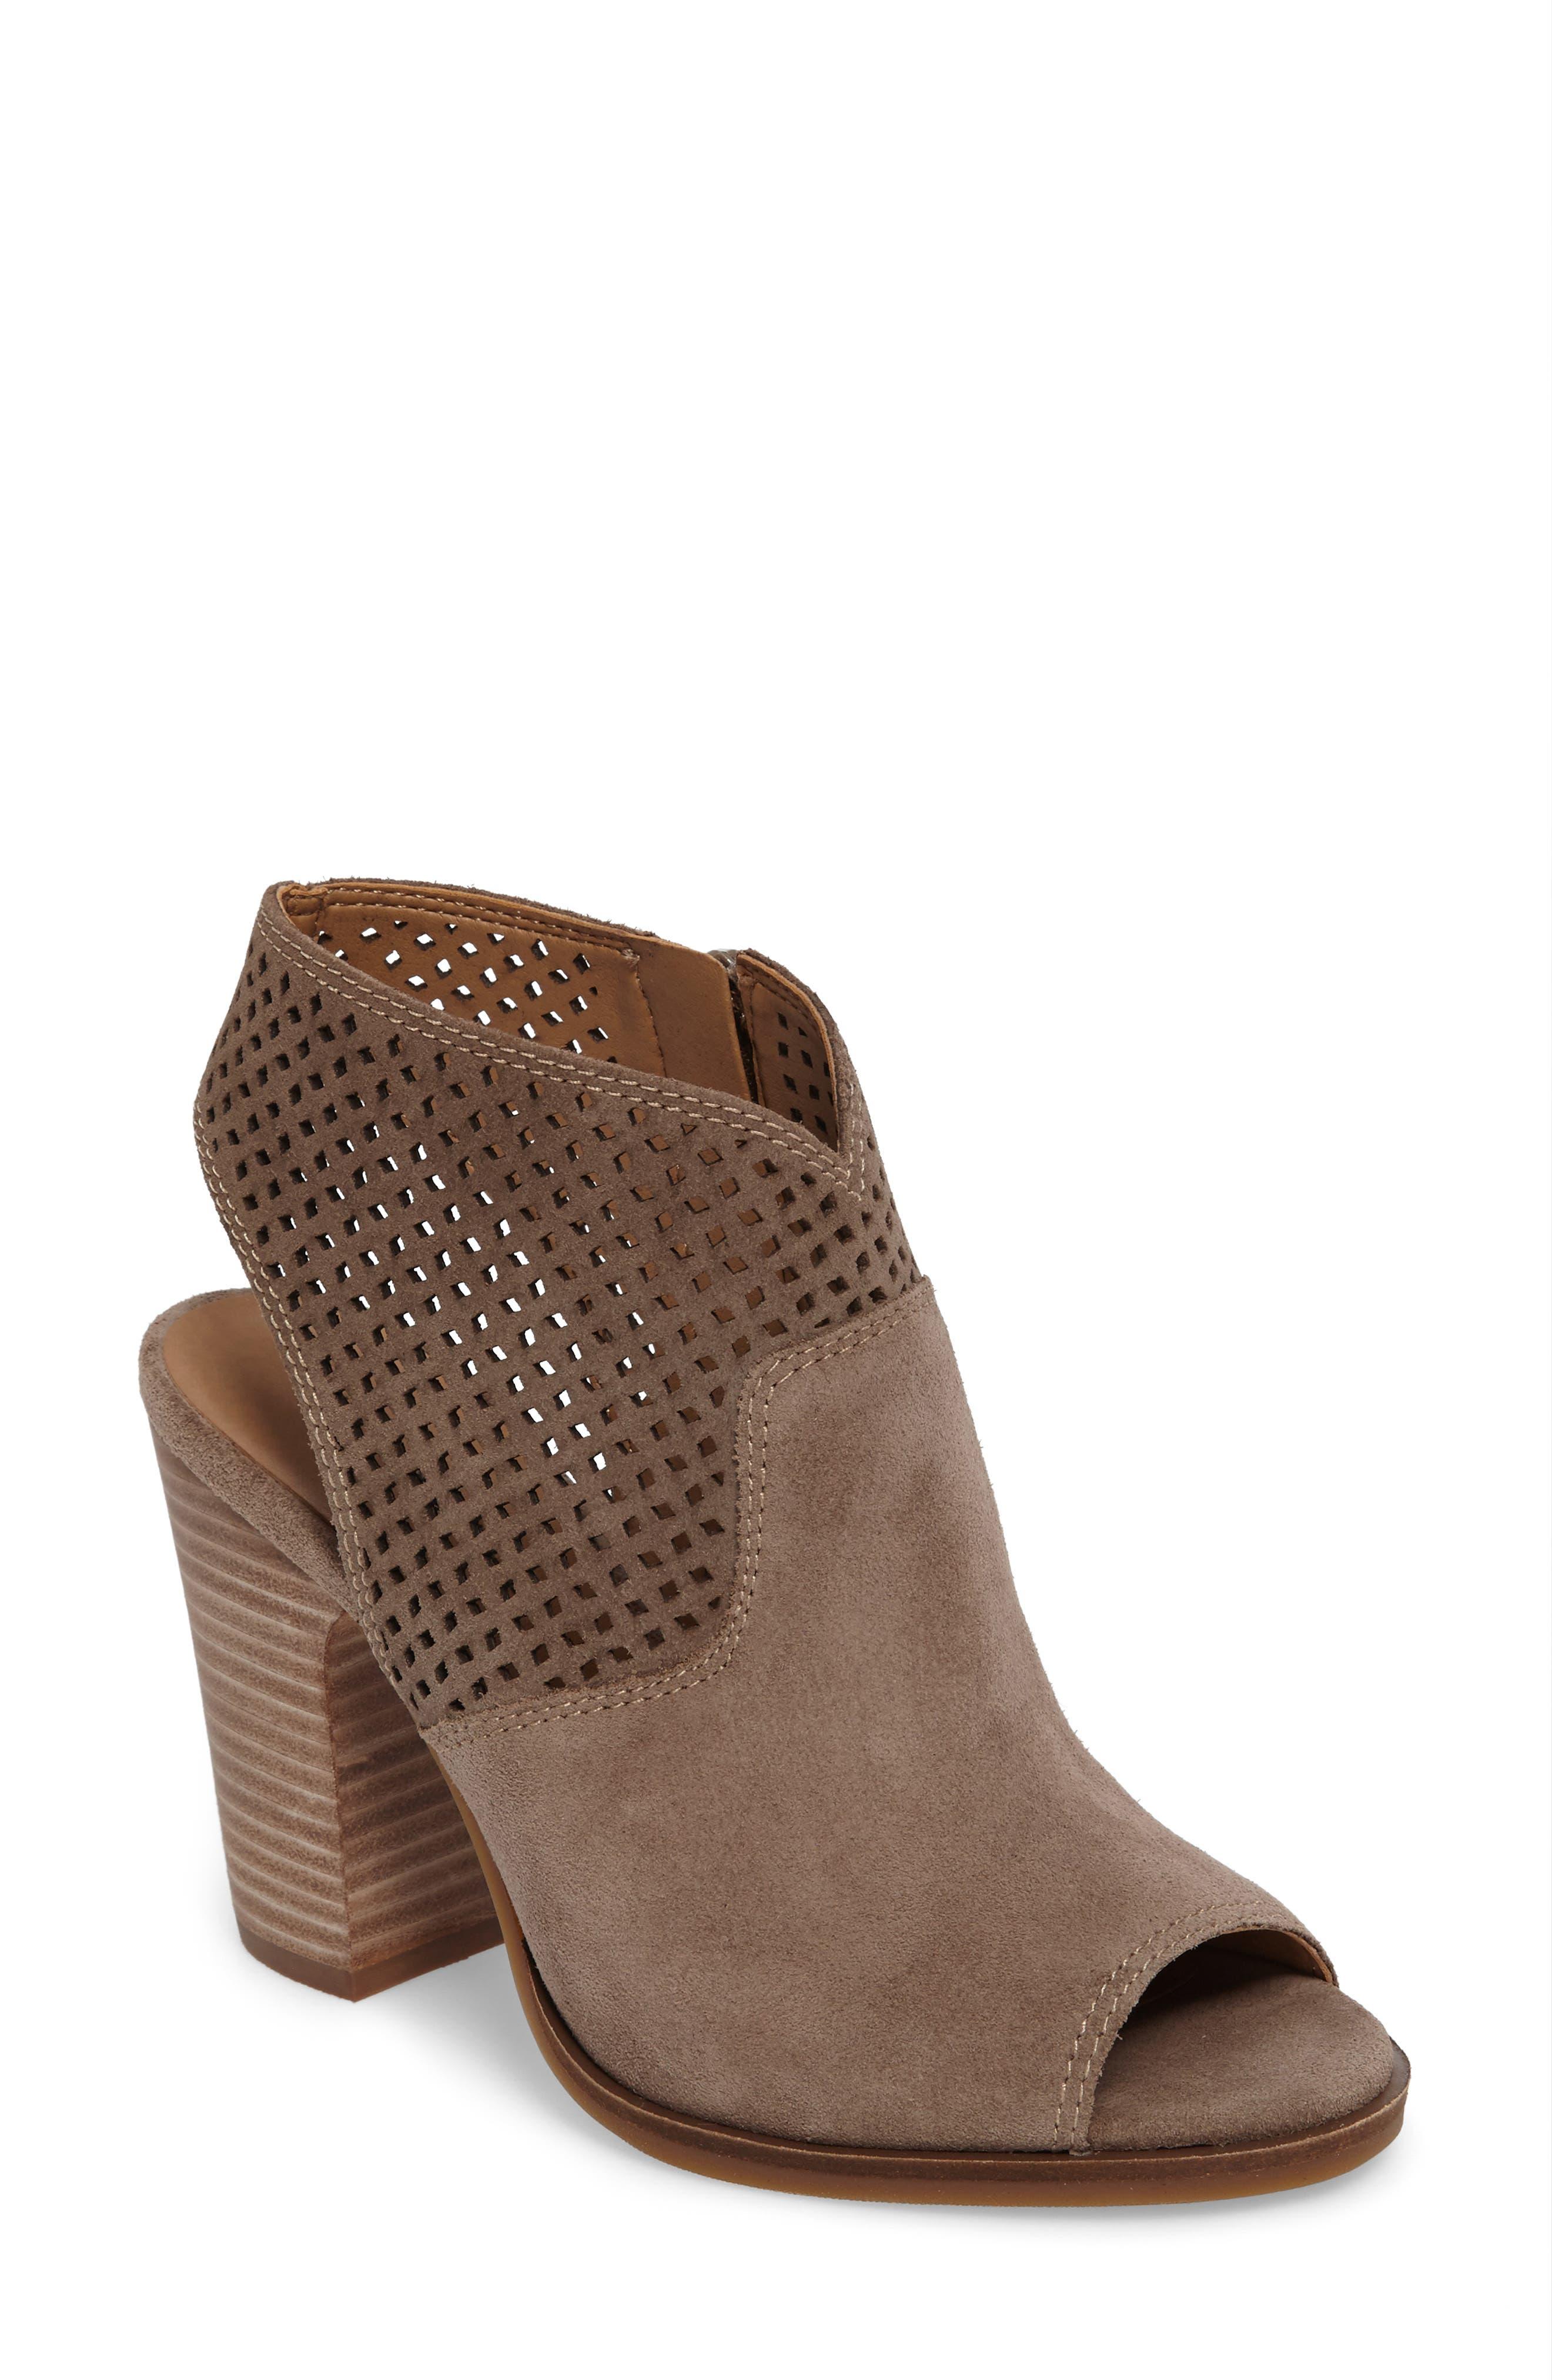 Alternate Image 1 Selected - Lucky Brand Lizara Perforated Block Heel Sandal (Women)